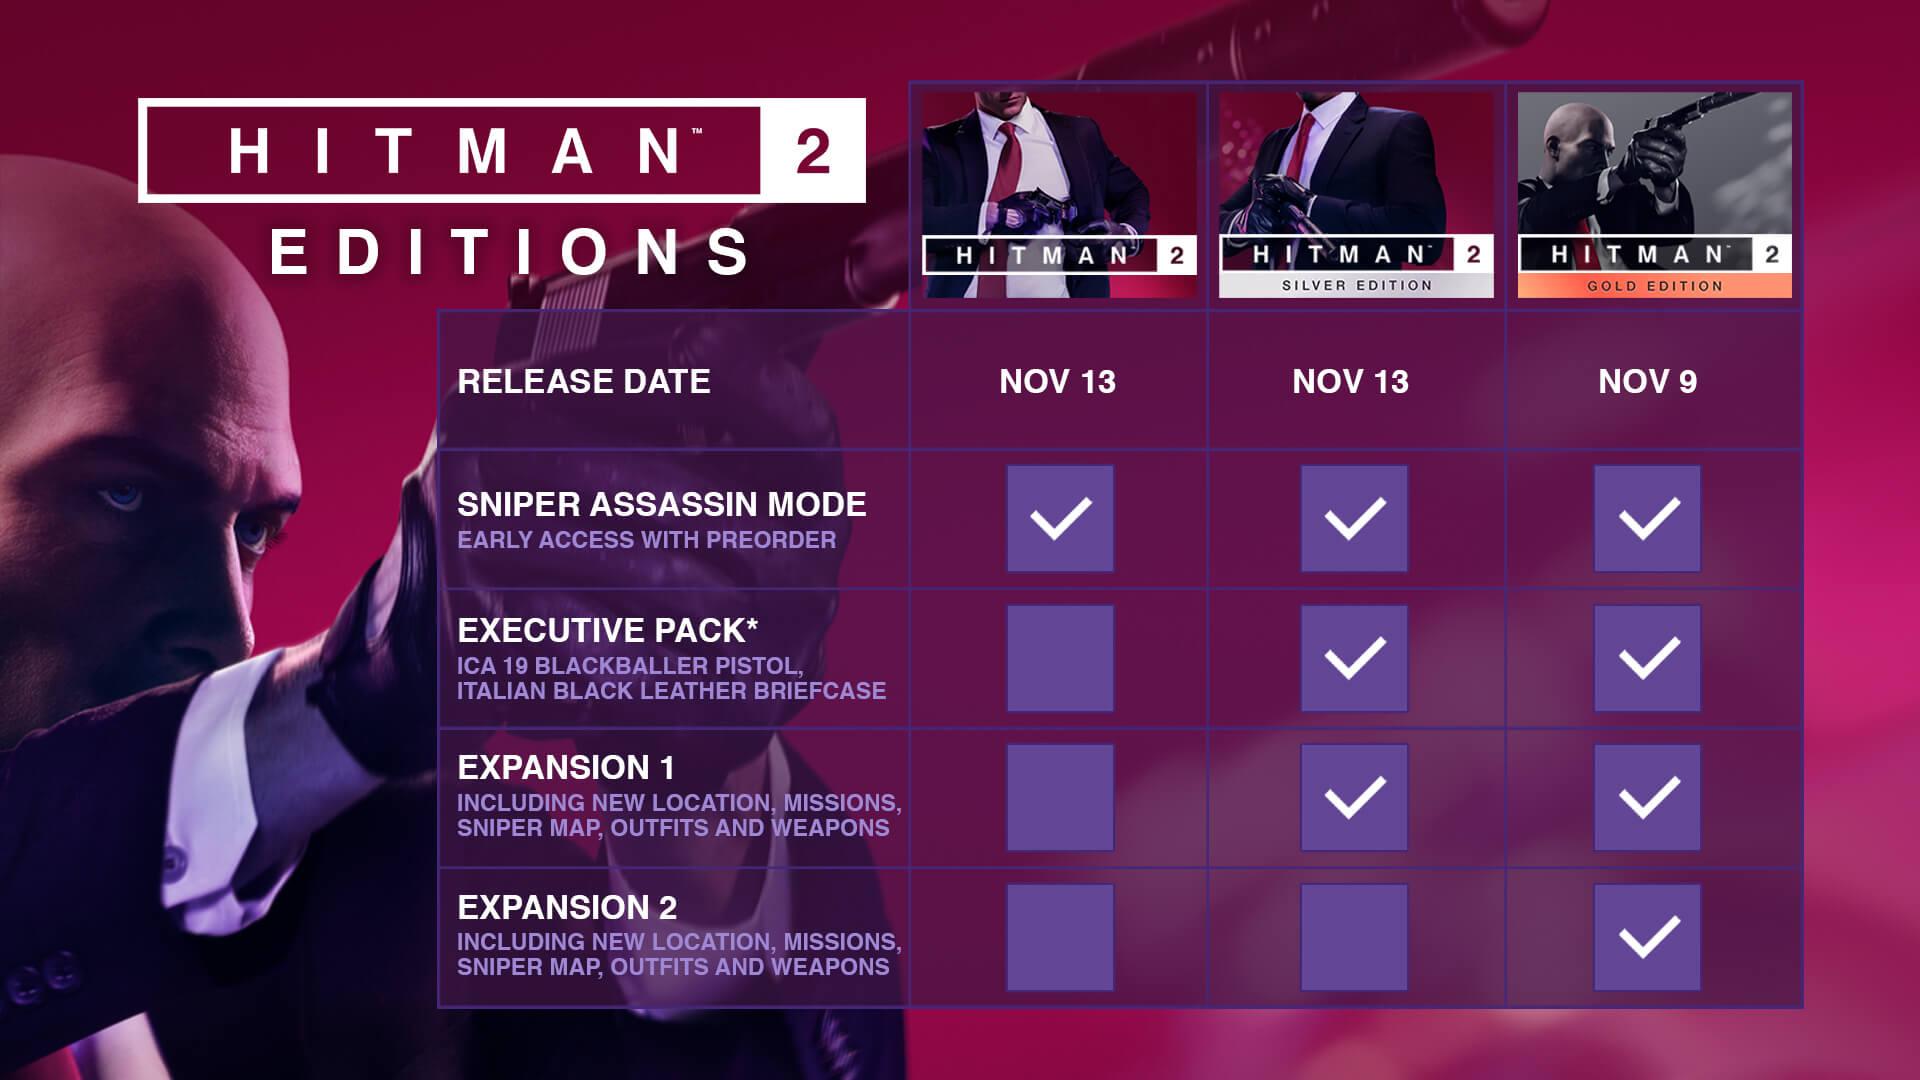 Hitman 2 Silver Edition Pc Steam Game Fanatical